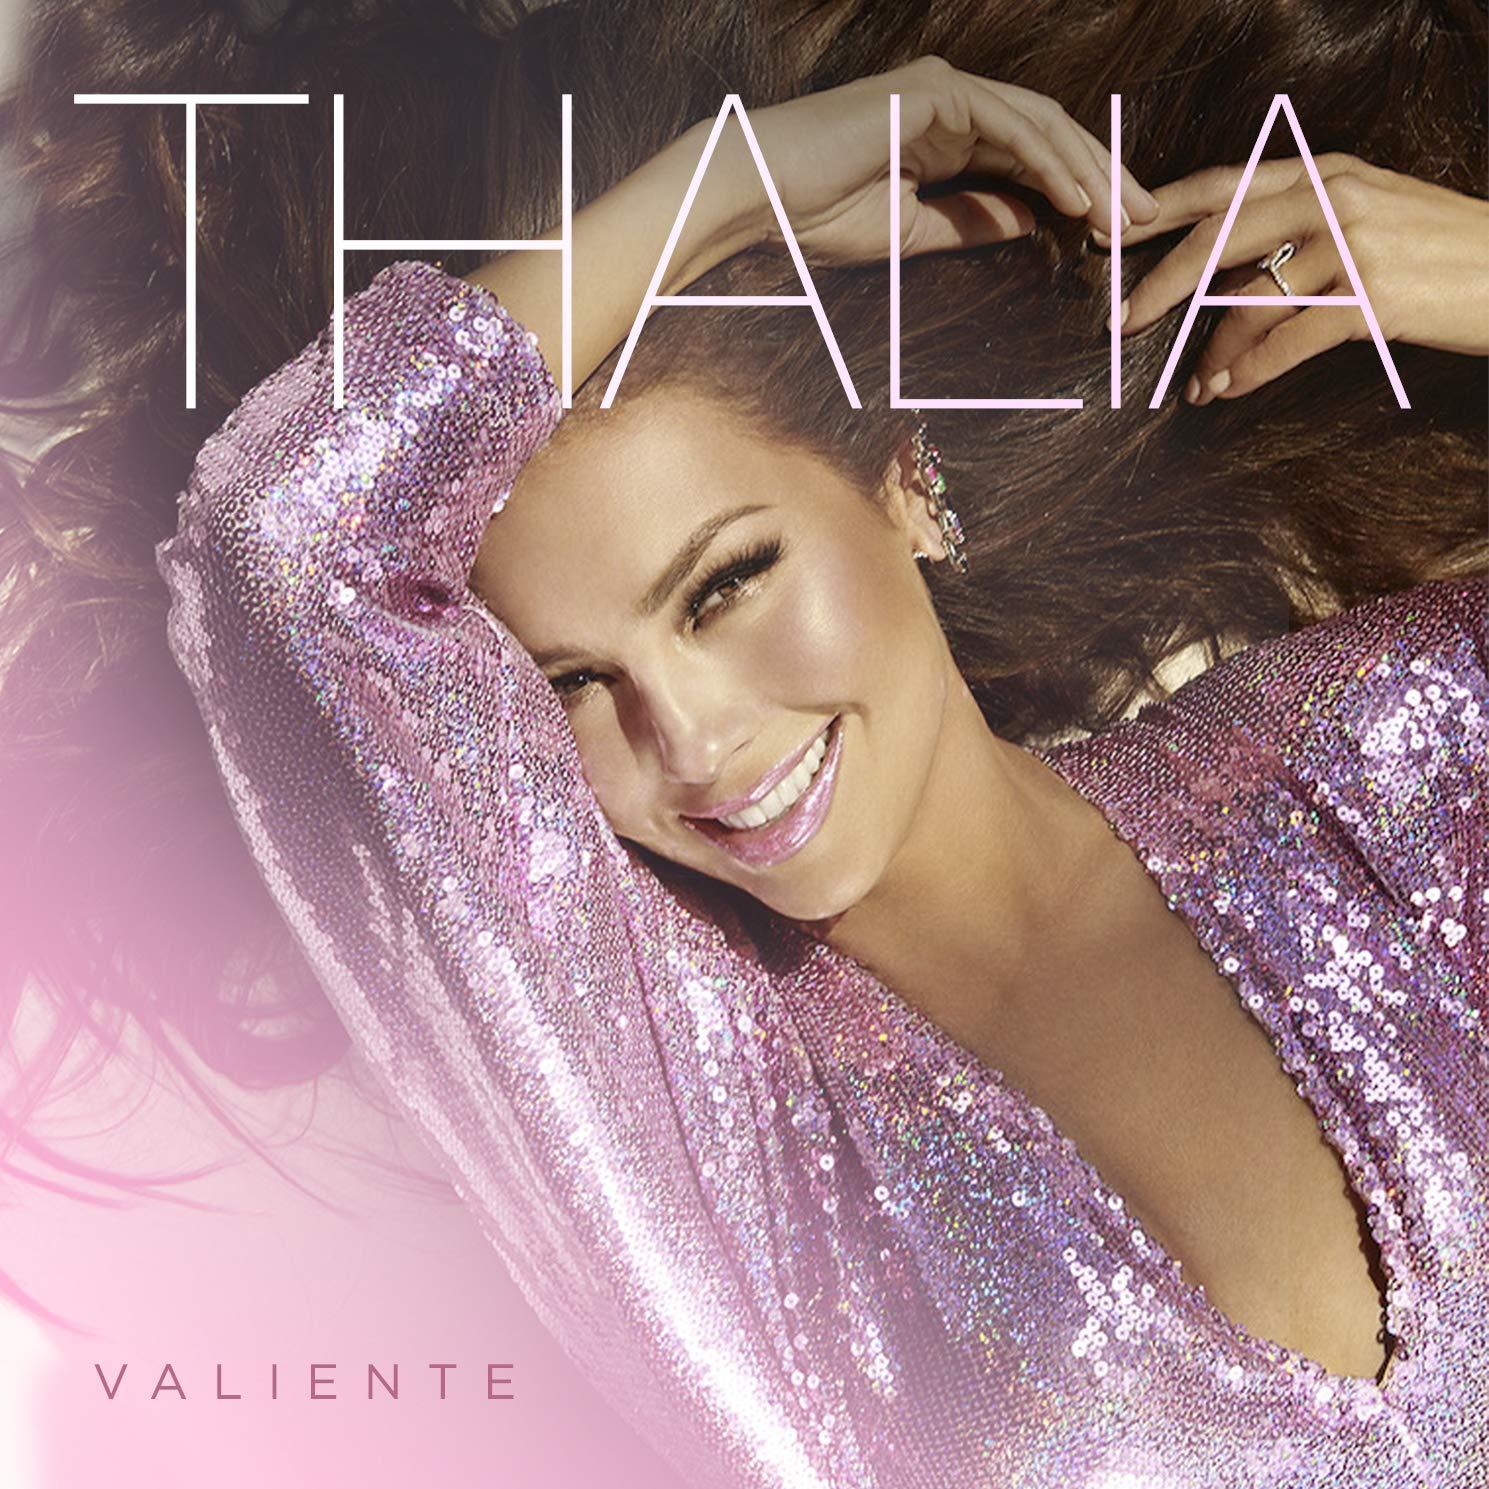 CD : Thalia - Valiente (CD)